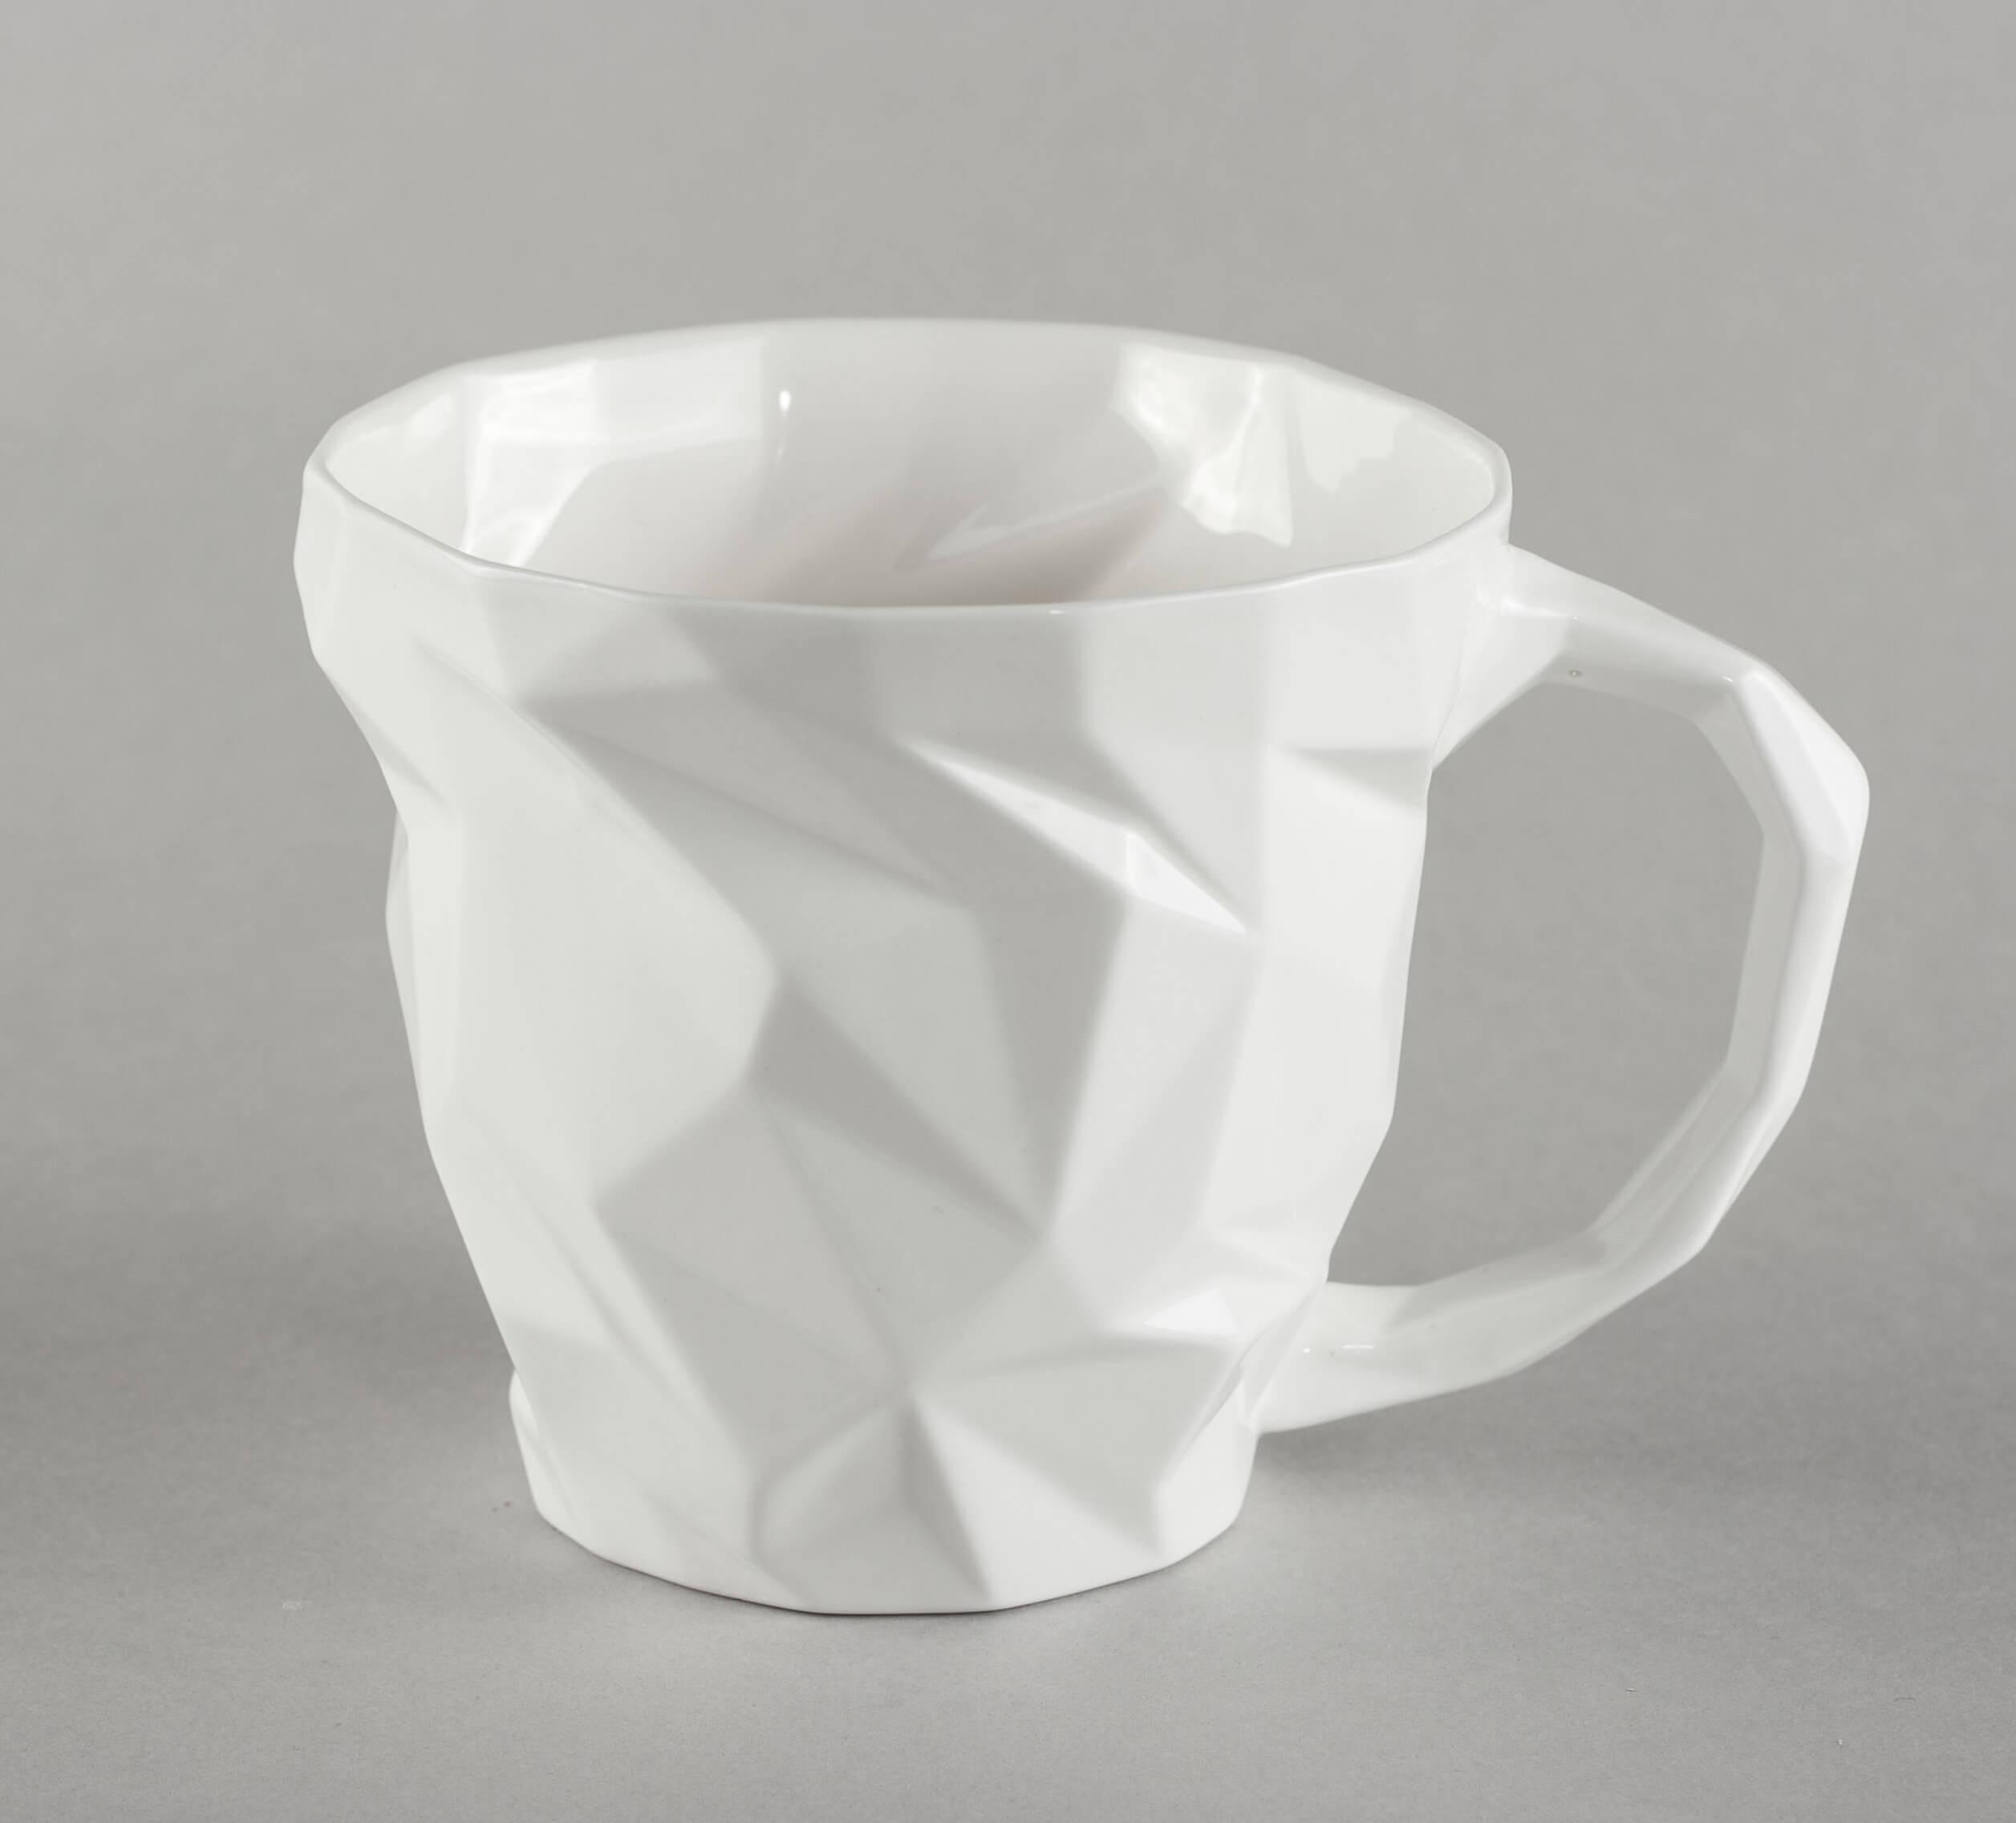 Piebalgas porcelain baltic design 5 Piebalga Porcelain